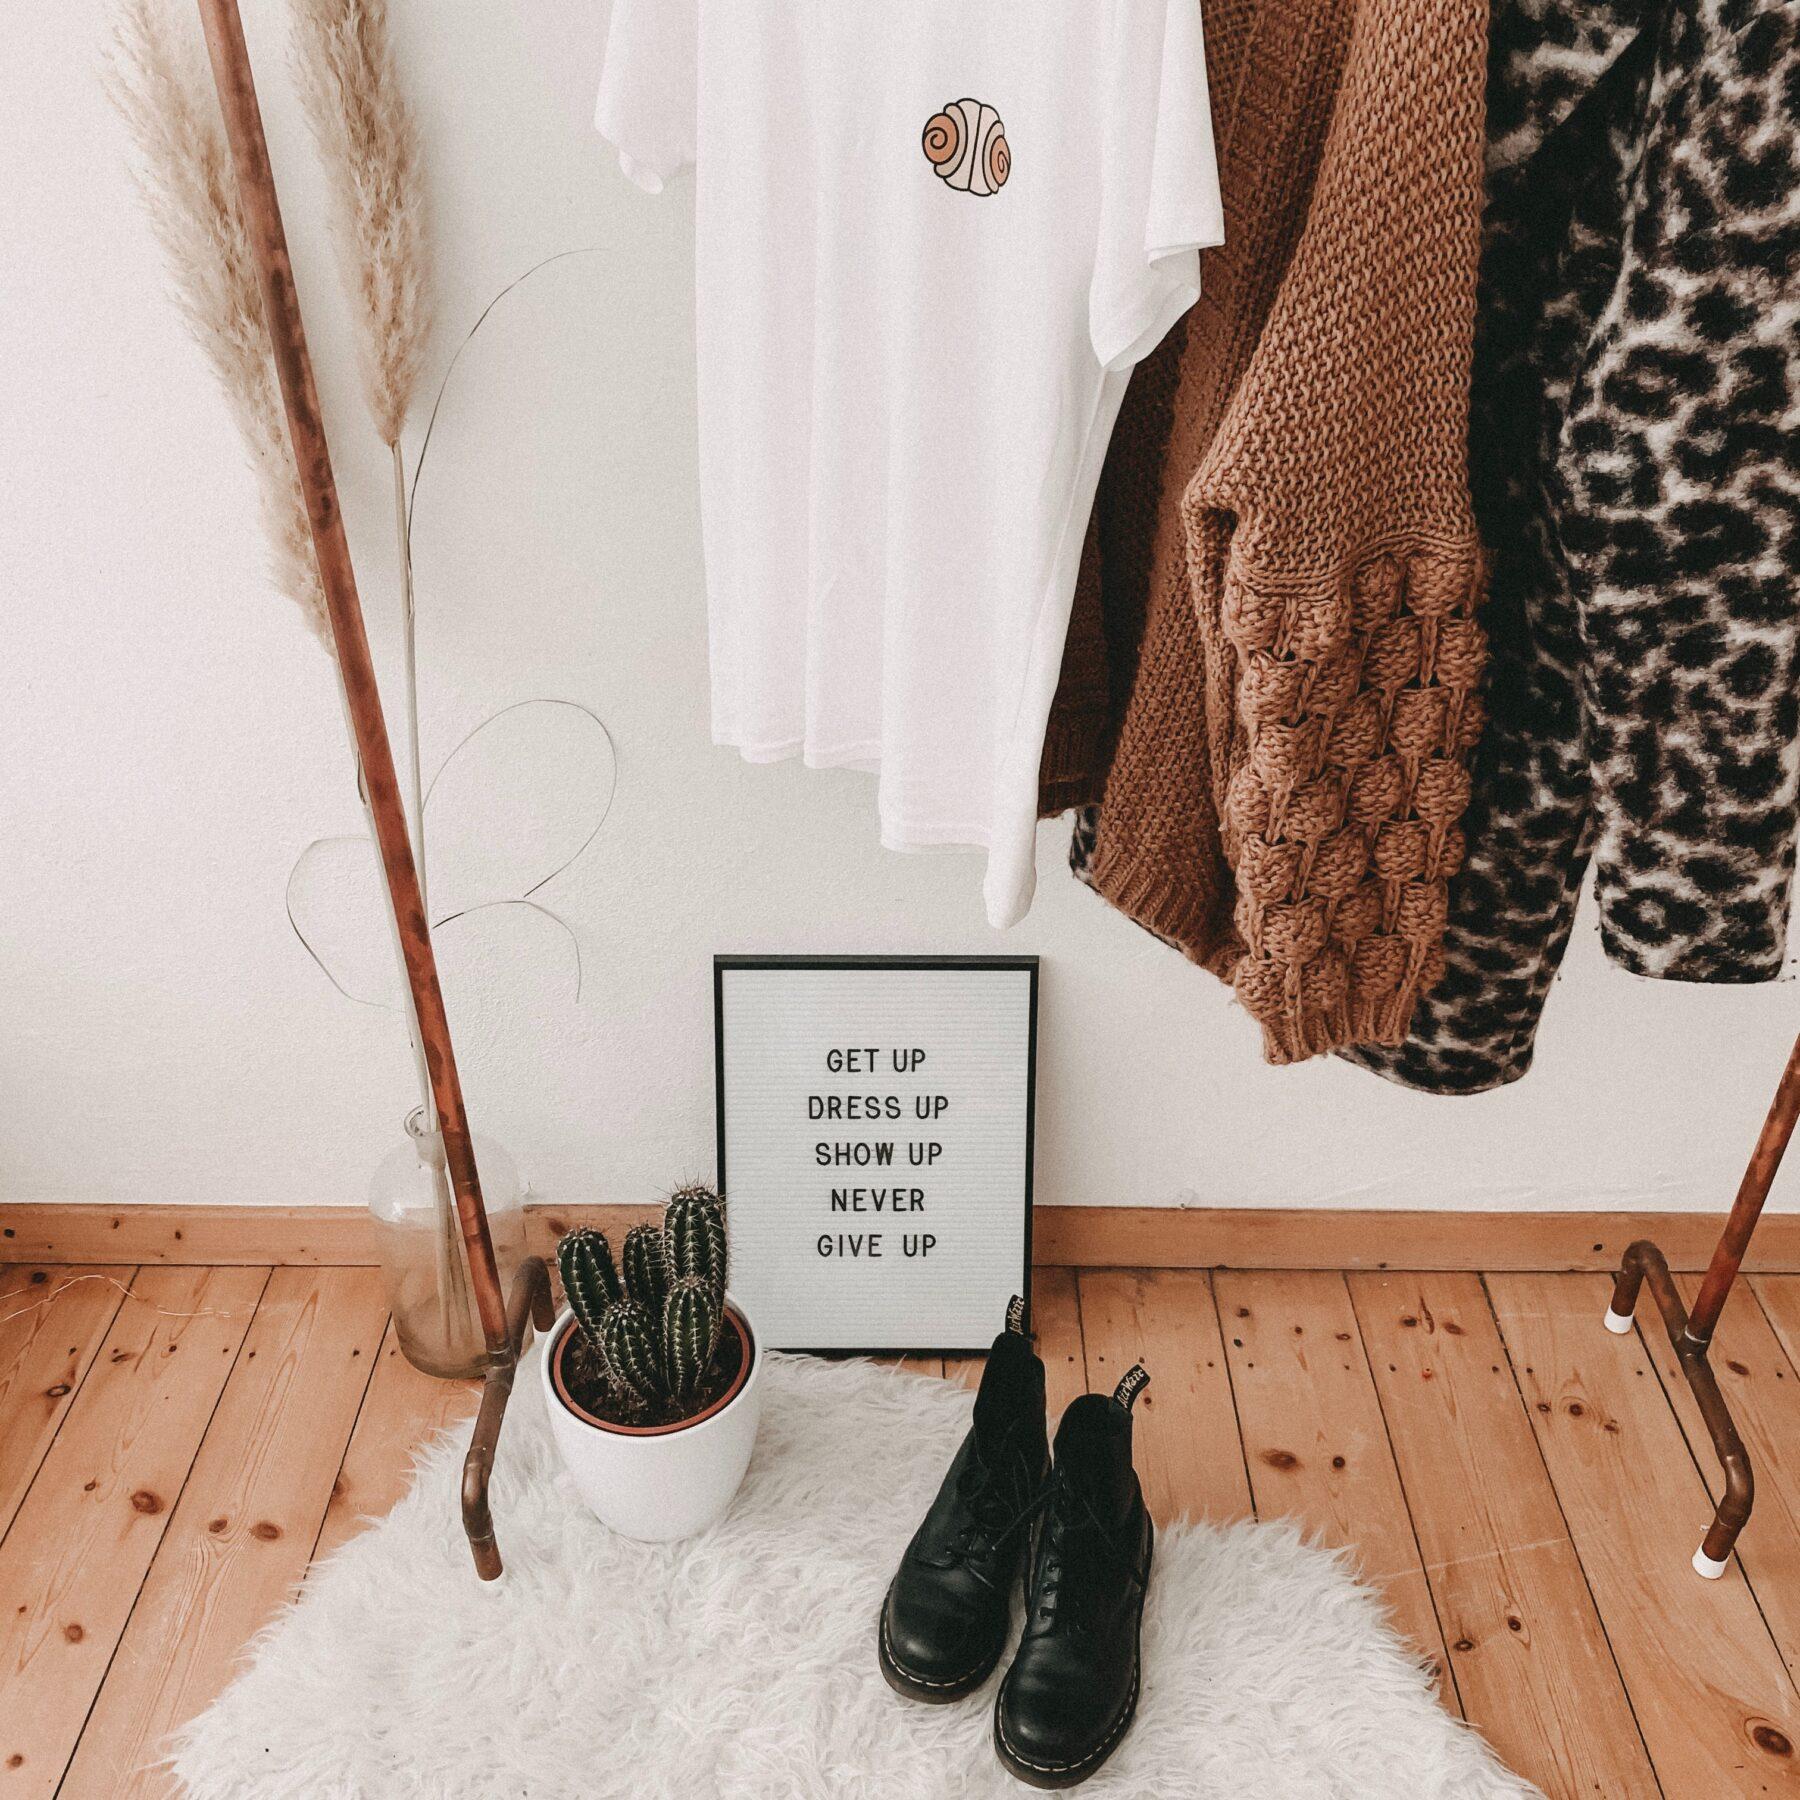 ubrania-minimalizm-blog-chociazby-pl